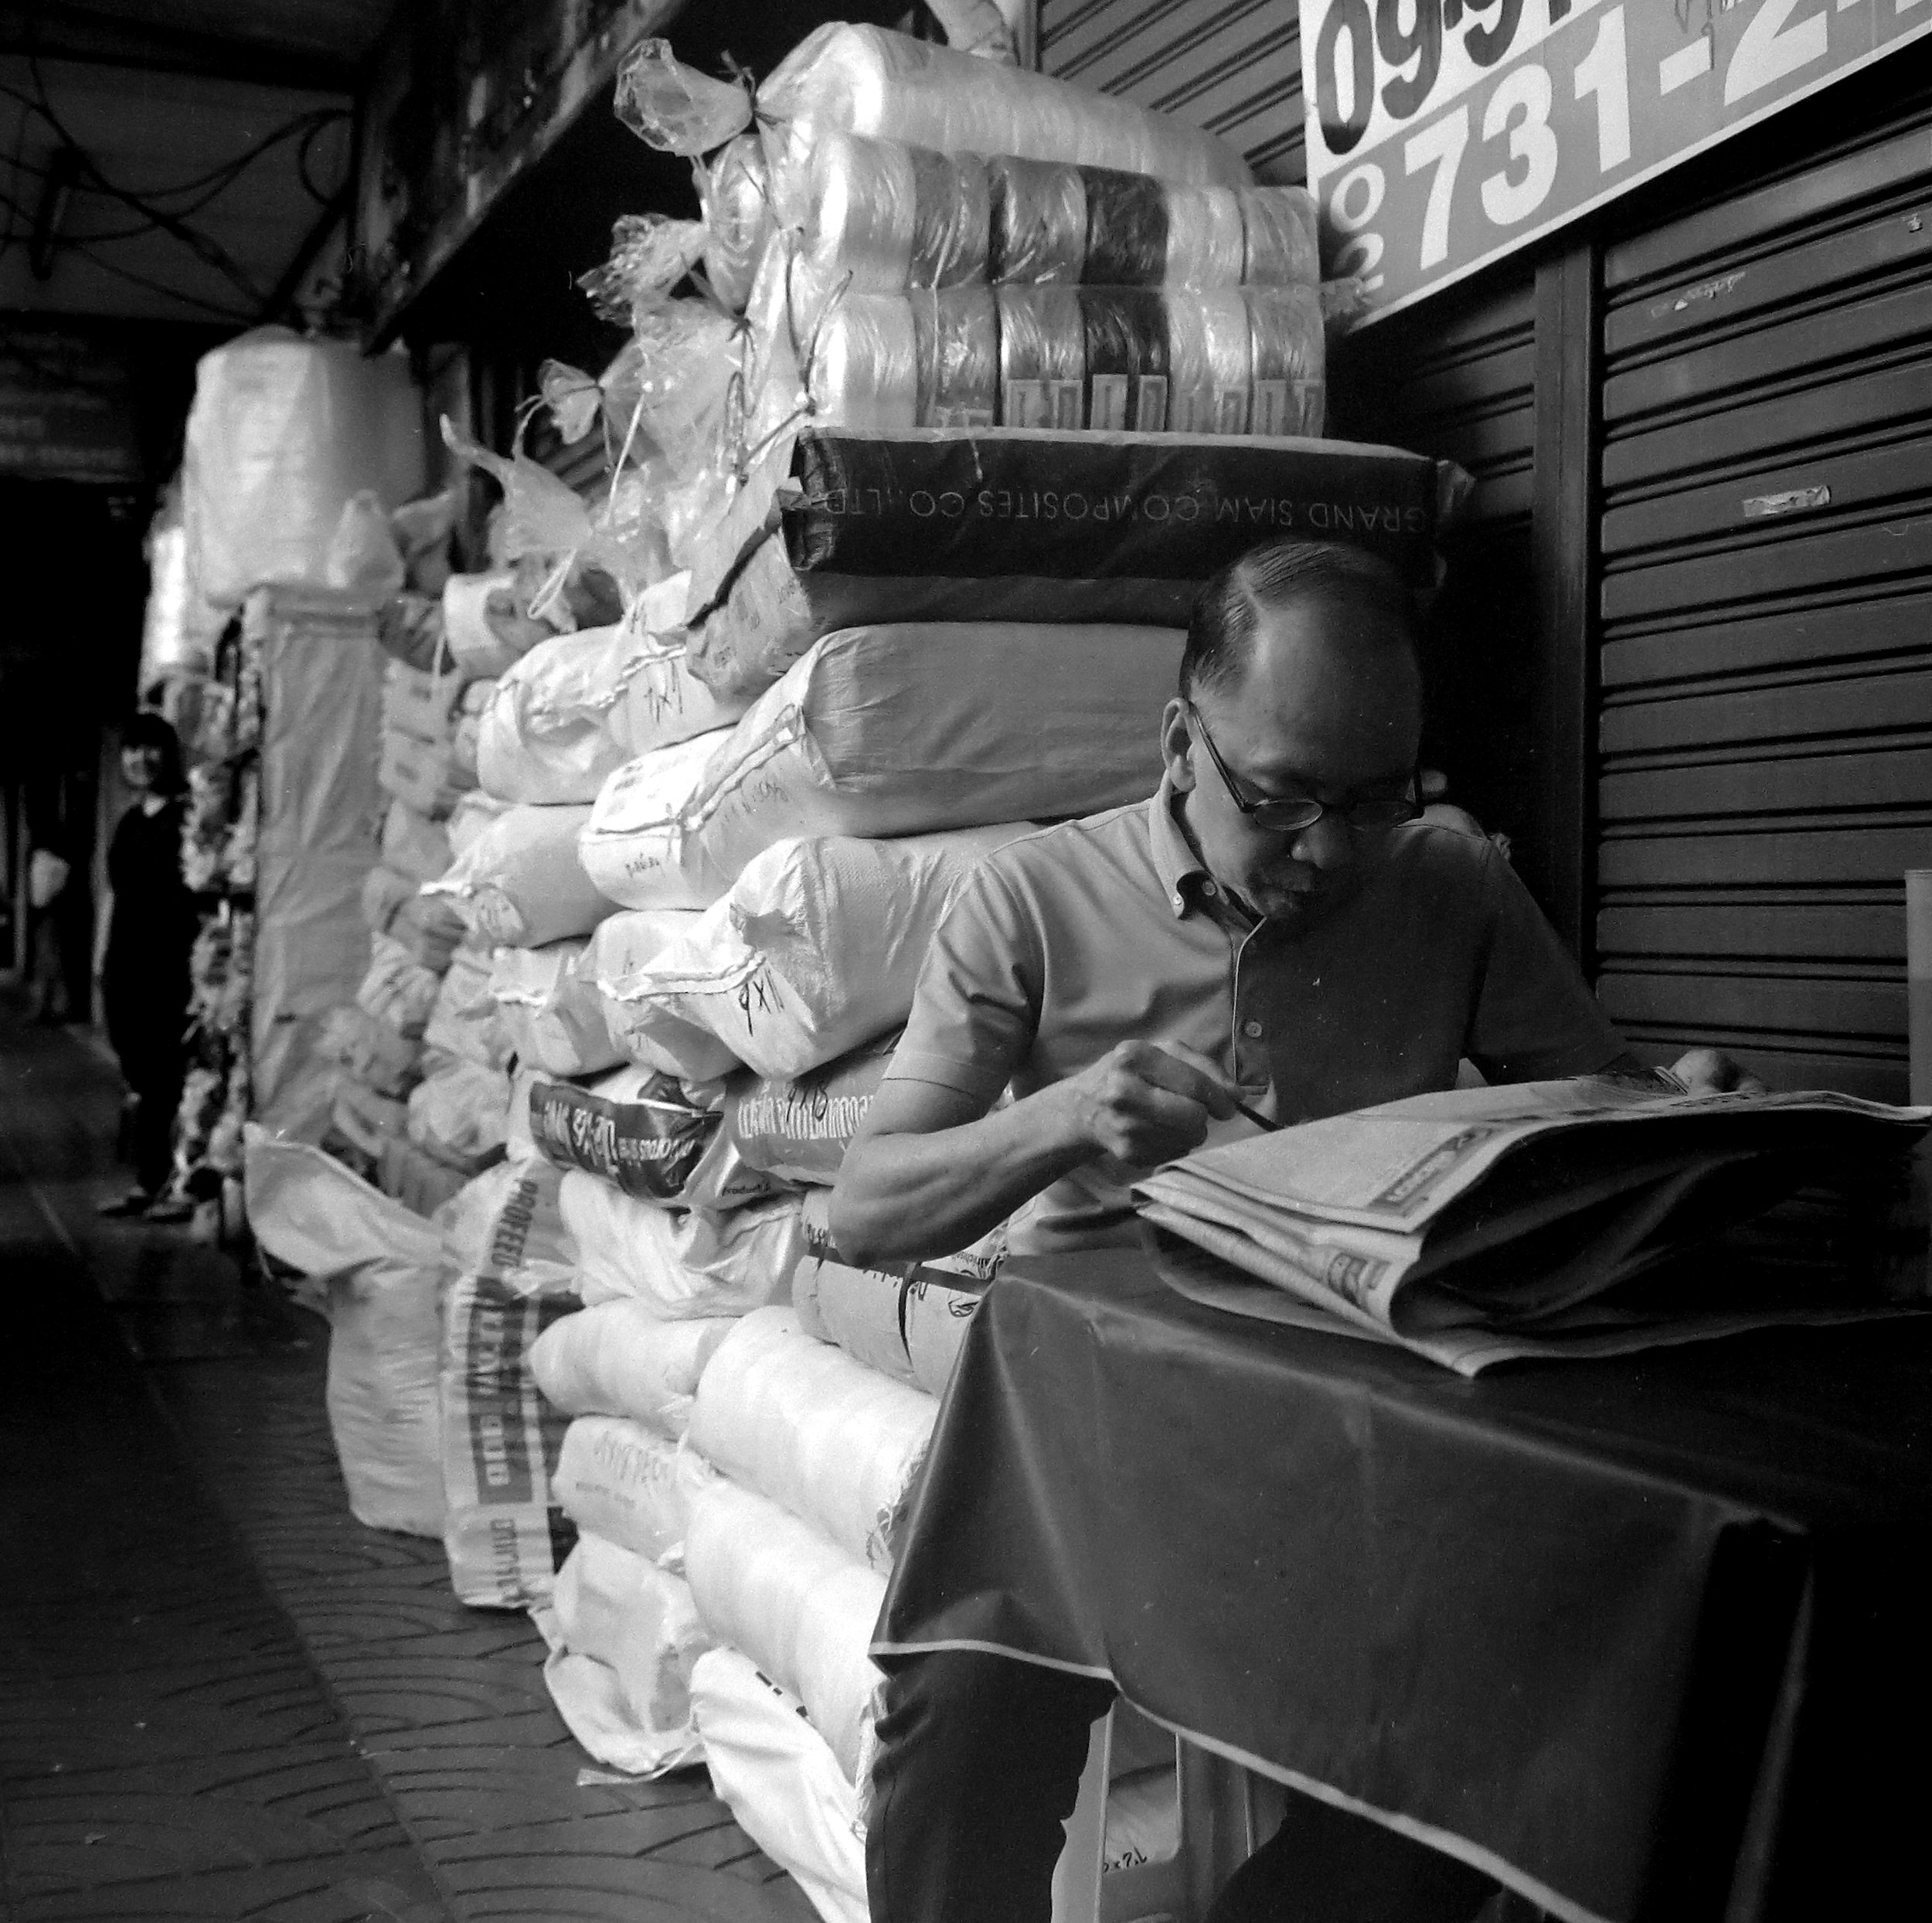 Chromacomaphoto Street photography guide bangkok thailand chinatown rolleiflex delta 400 (4).JPG